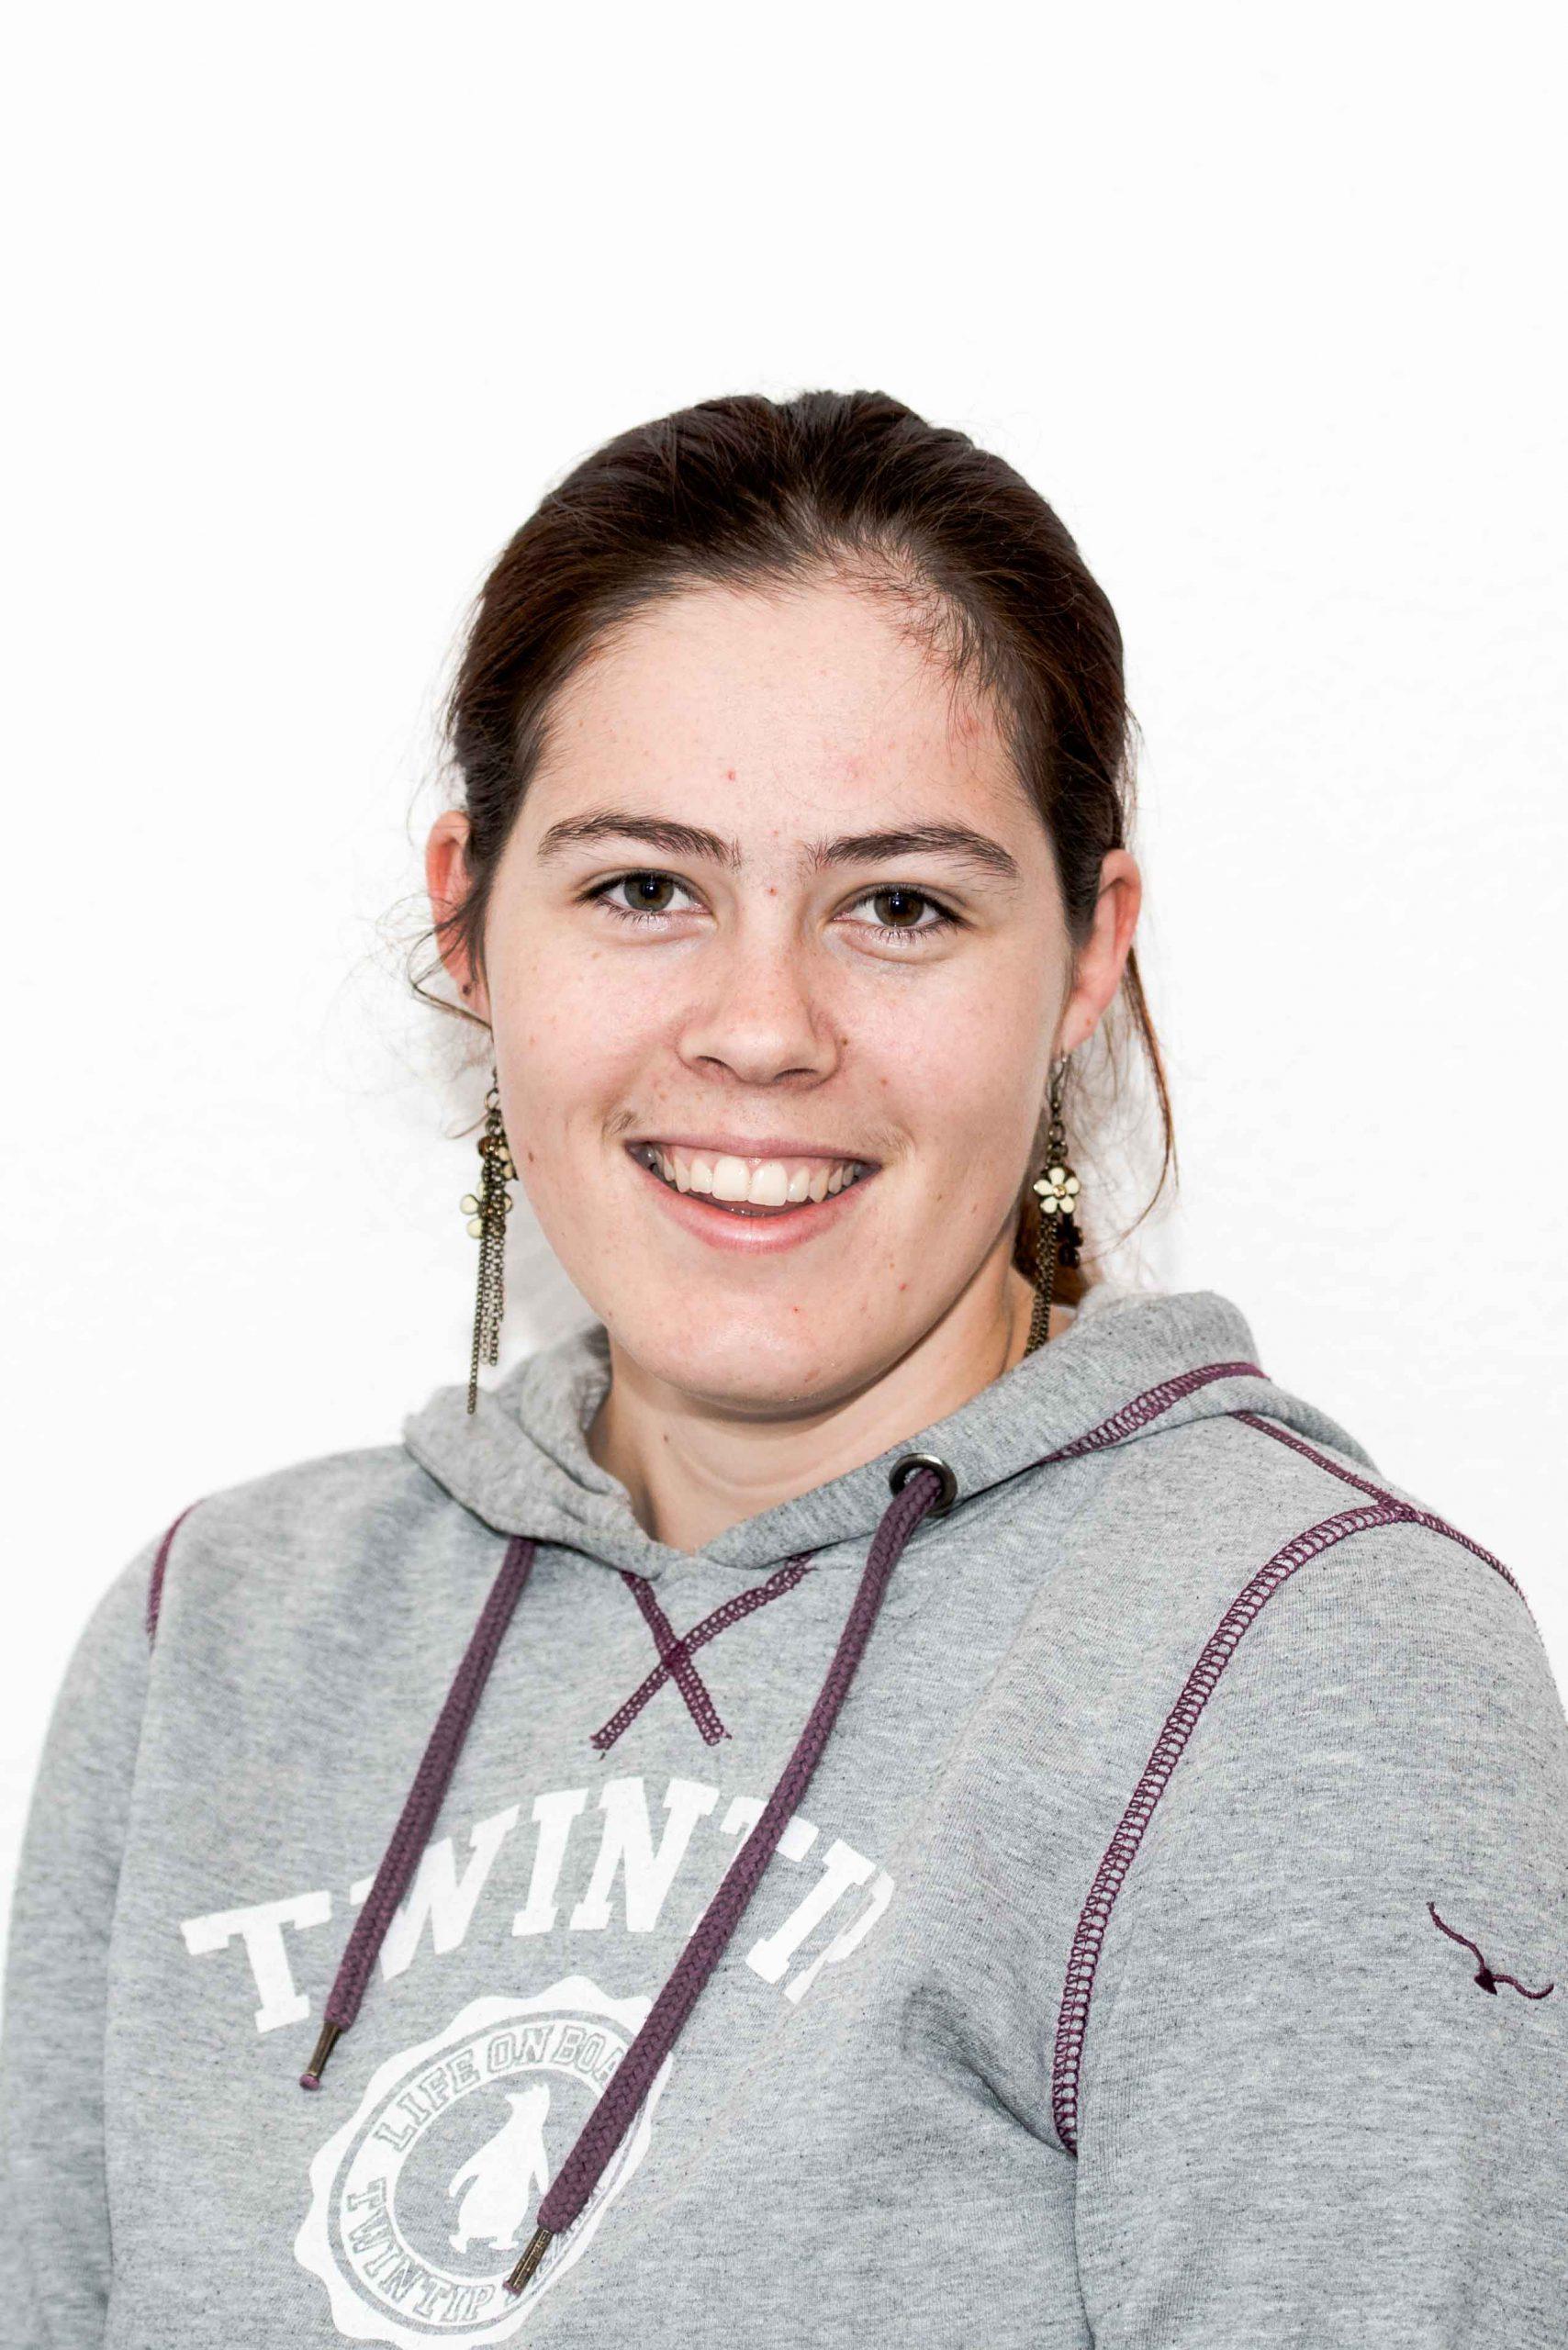 Lorianne Paroz